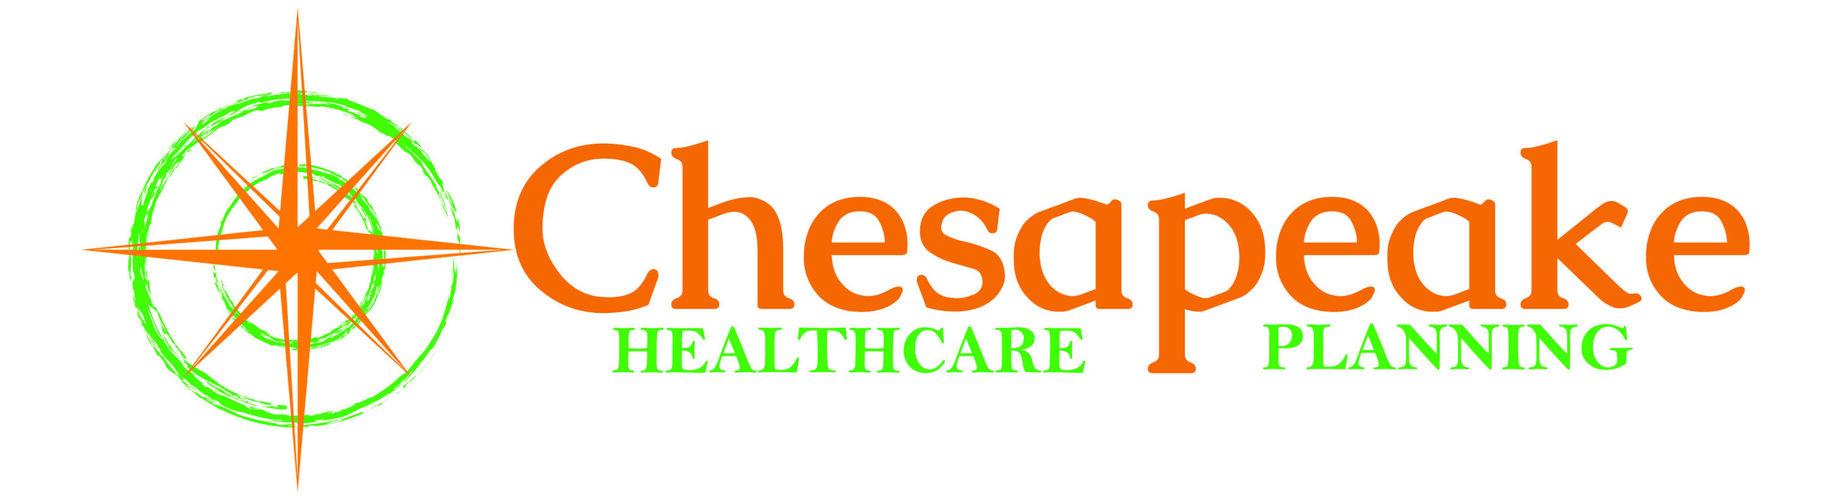 Chesapeake Healthcare Planning LLC